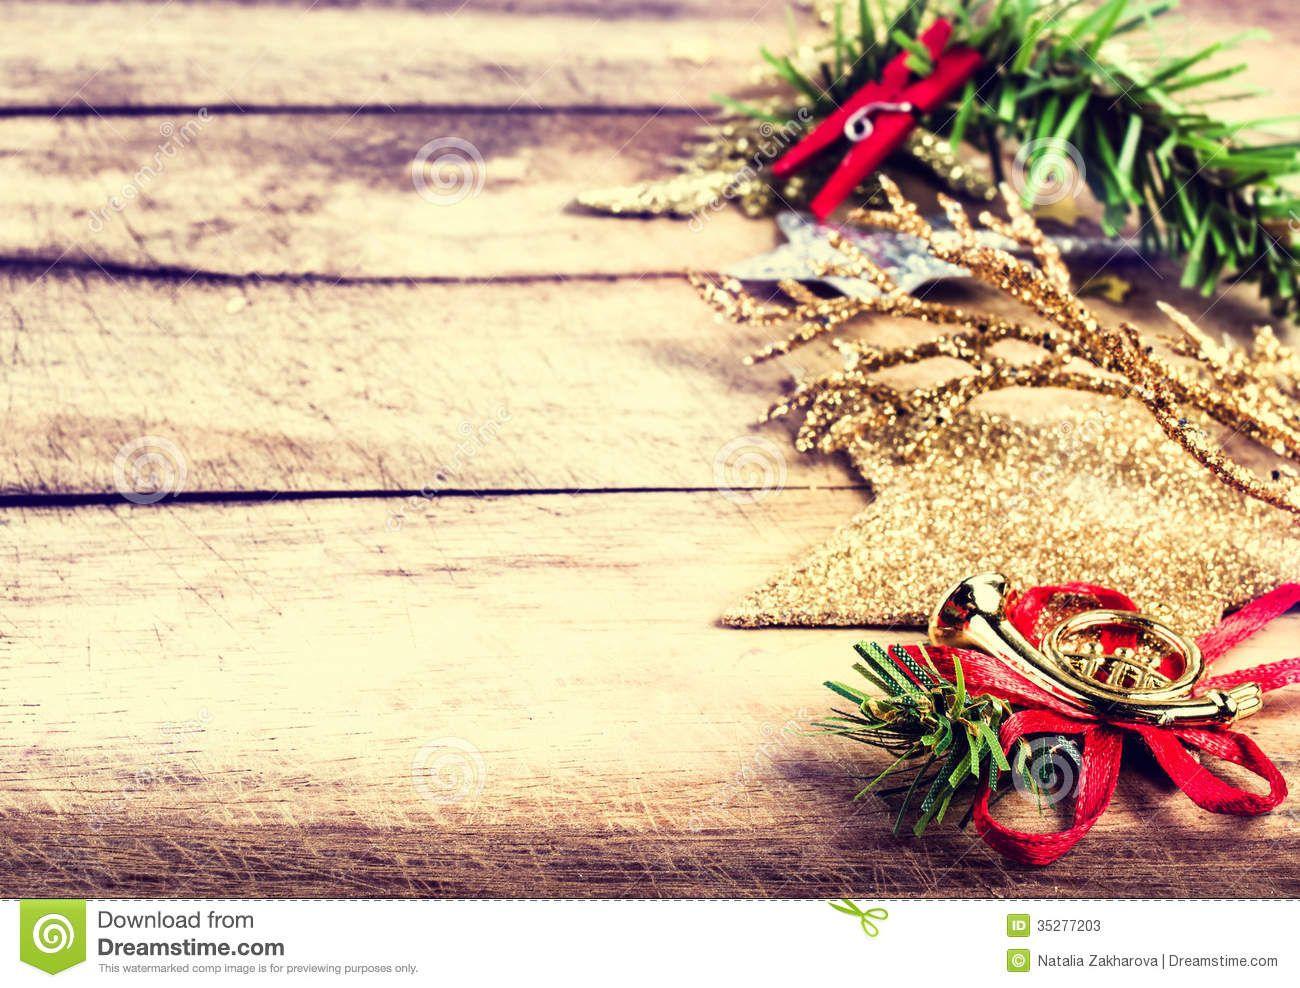 Fondos Verdes De Navidad Para Pantalla Hd 2 Hd Wallpapers: Fondos Vintage Navidad Para Fondo De Pantalla En Hd 1 HD